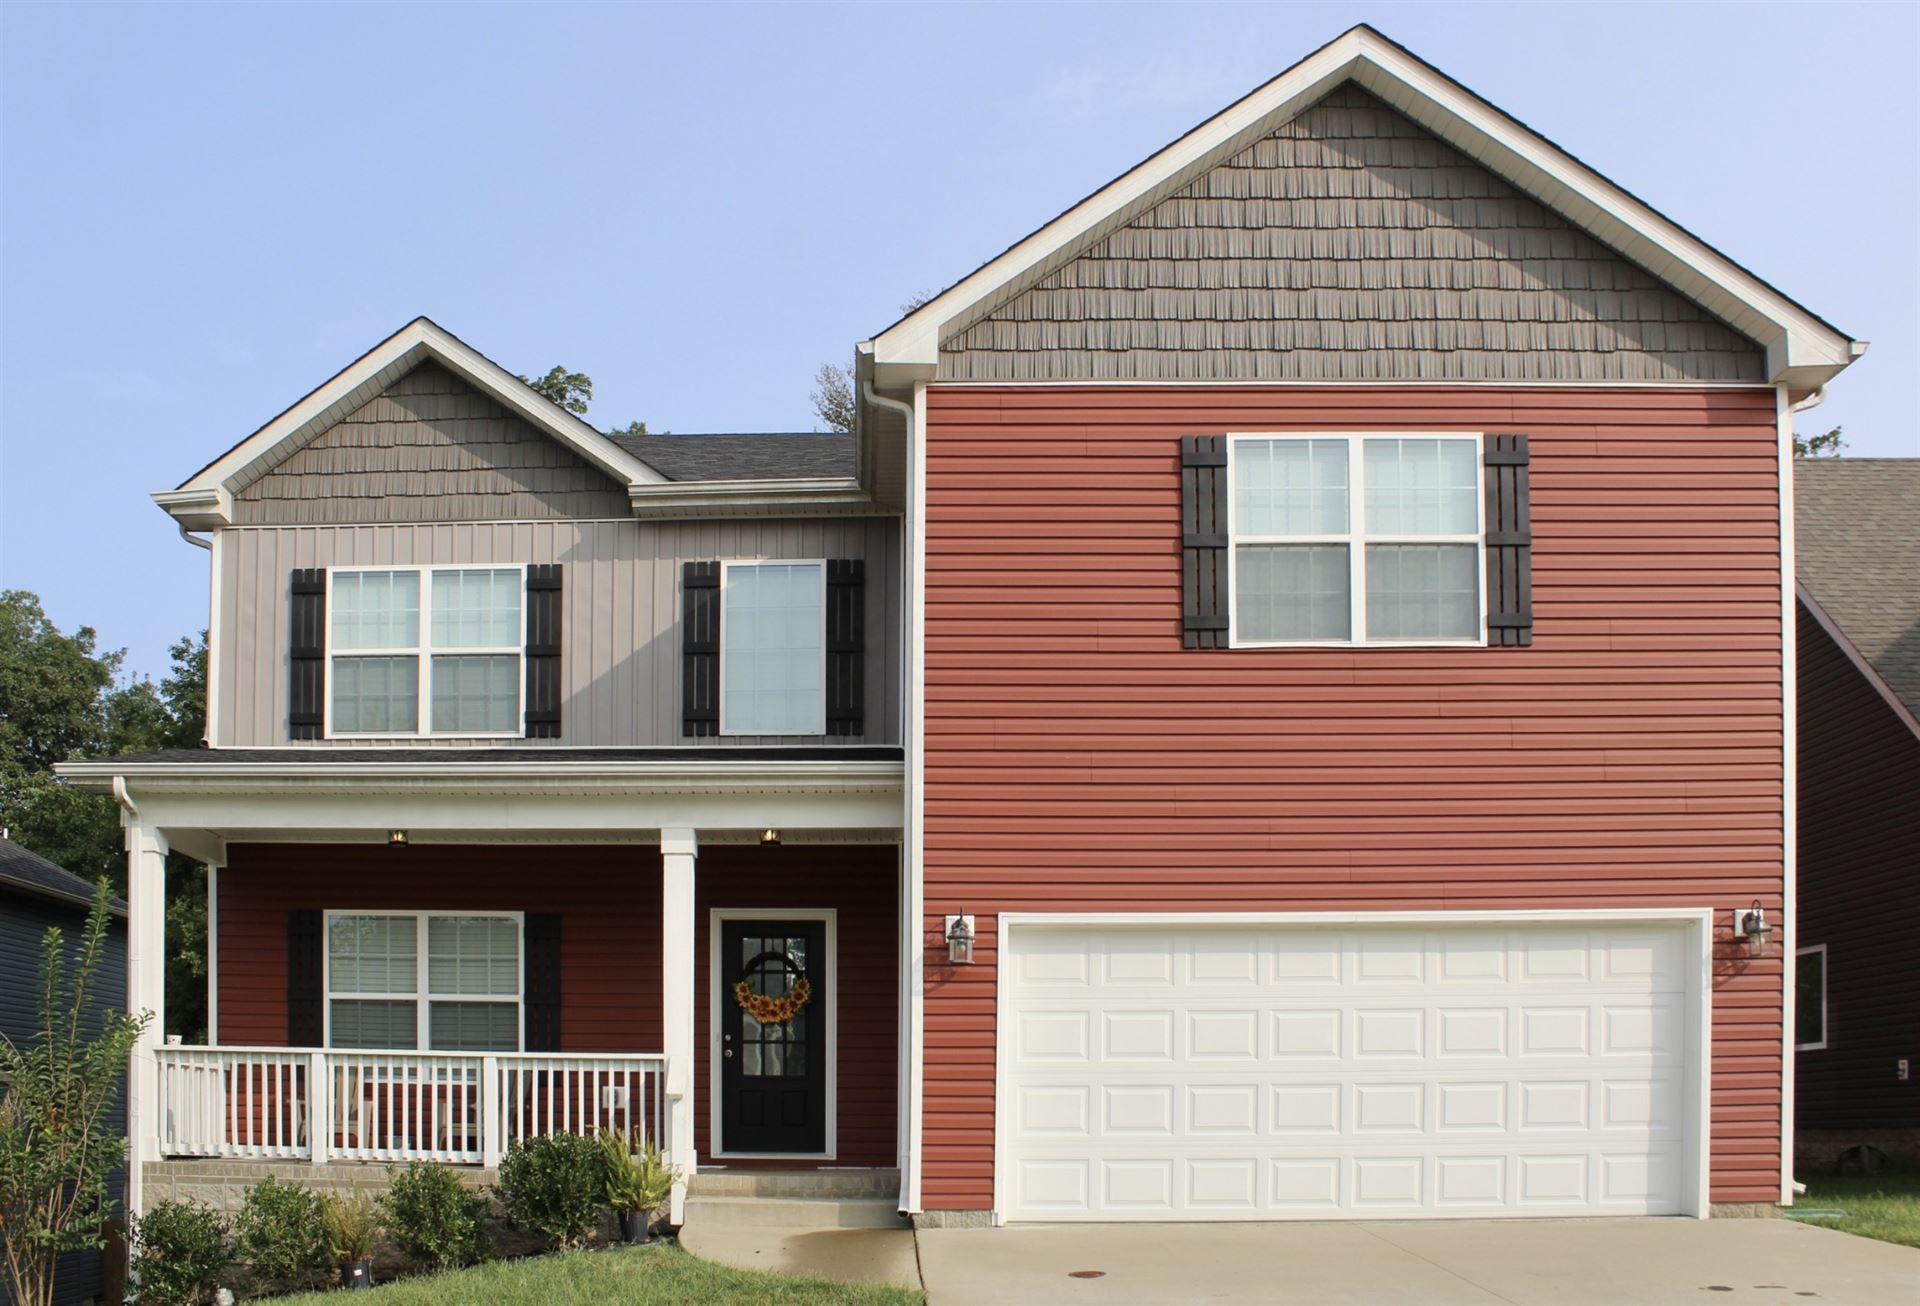 1154 Belvoir Ln, Clarksville, TN 37040 - MLS#: 2188943